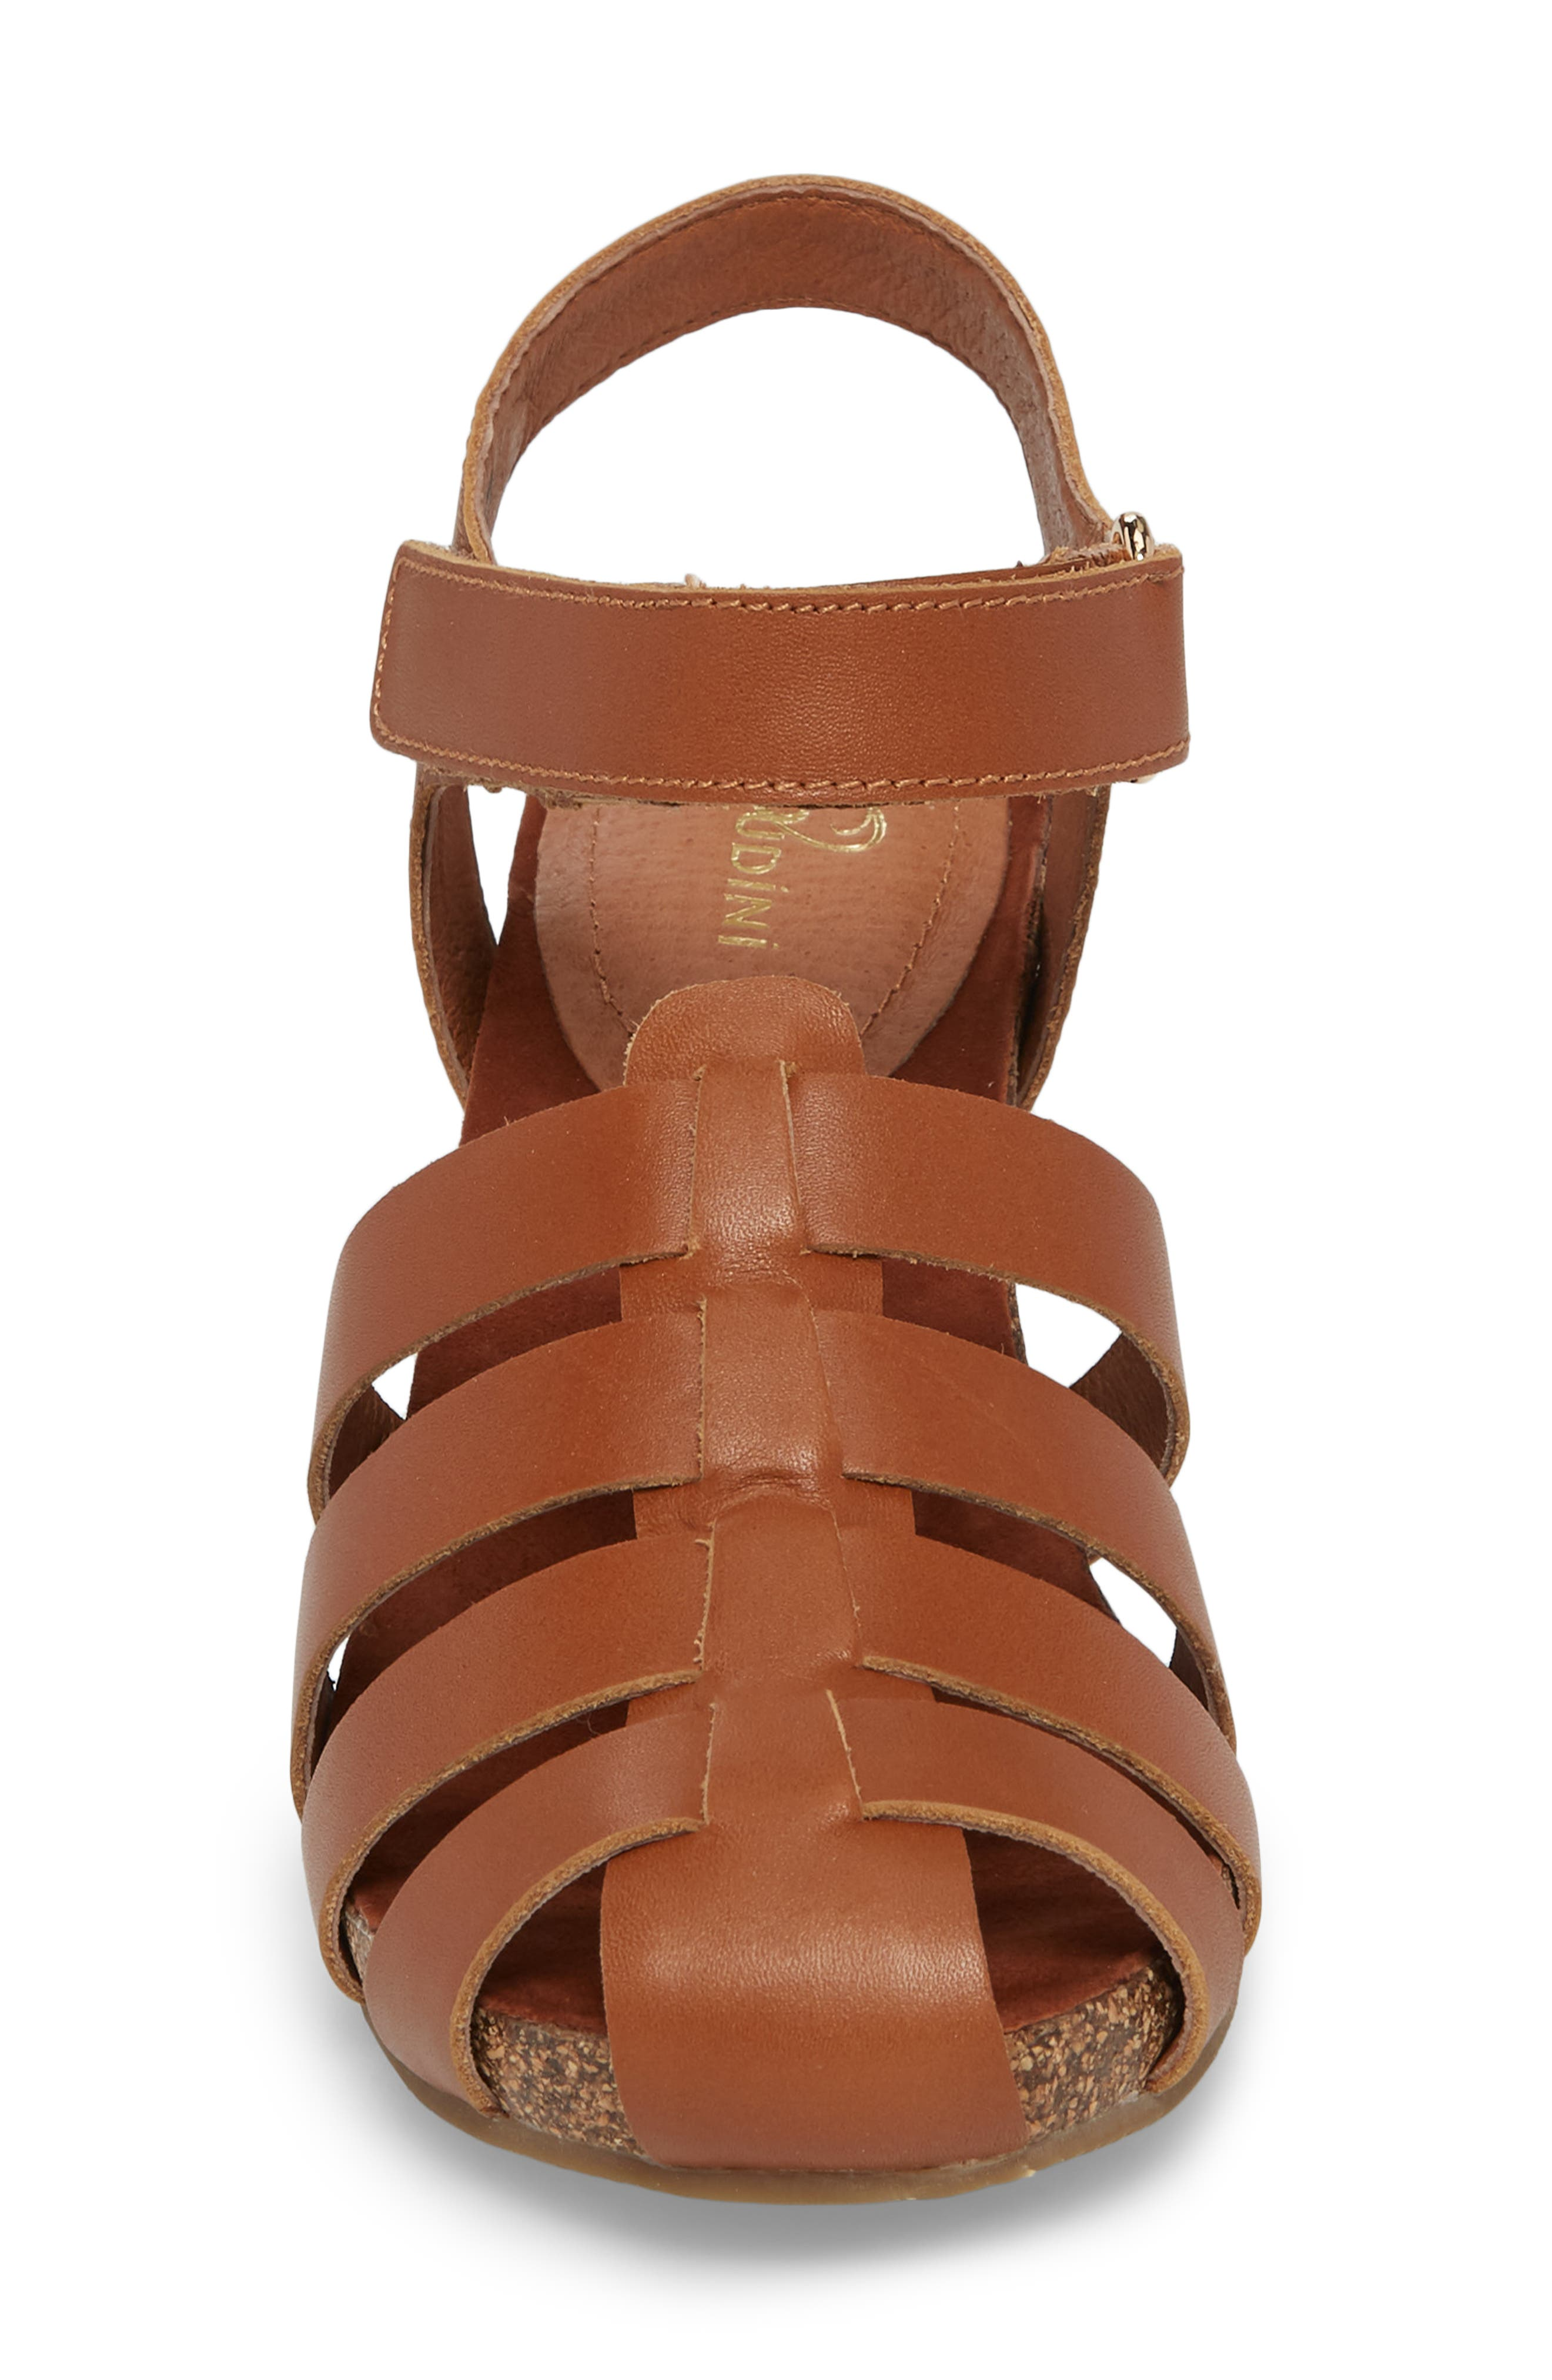 Carrara Block Heel Sandal,                             Alternate thumbnail 4, color,                             Cognac Leather